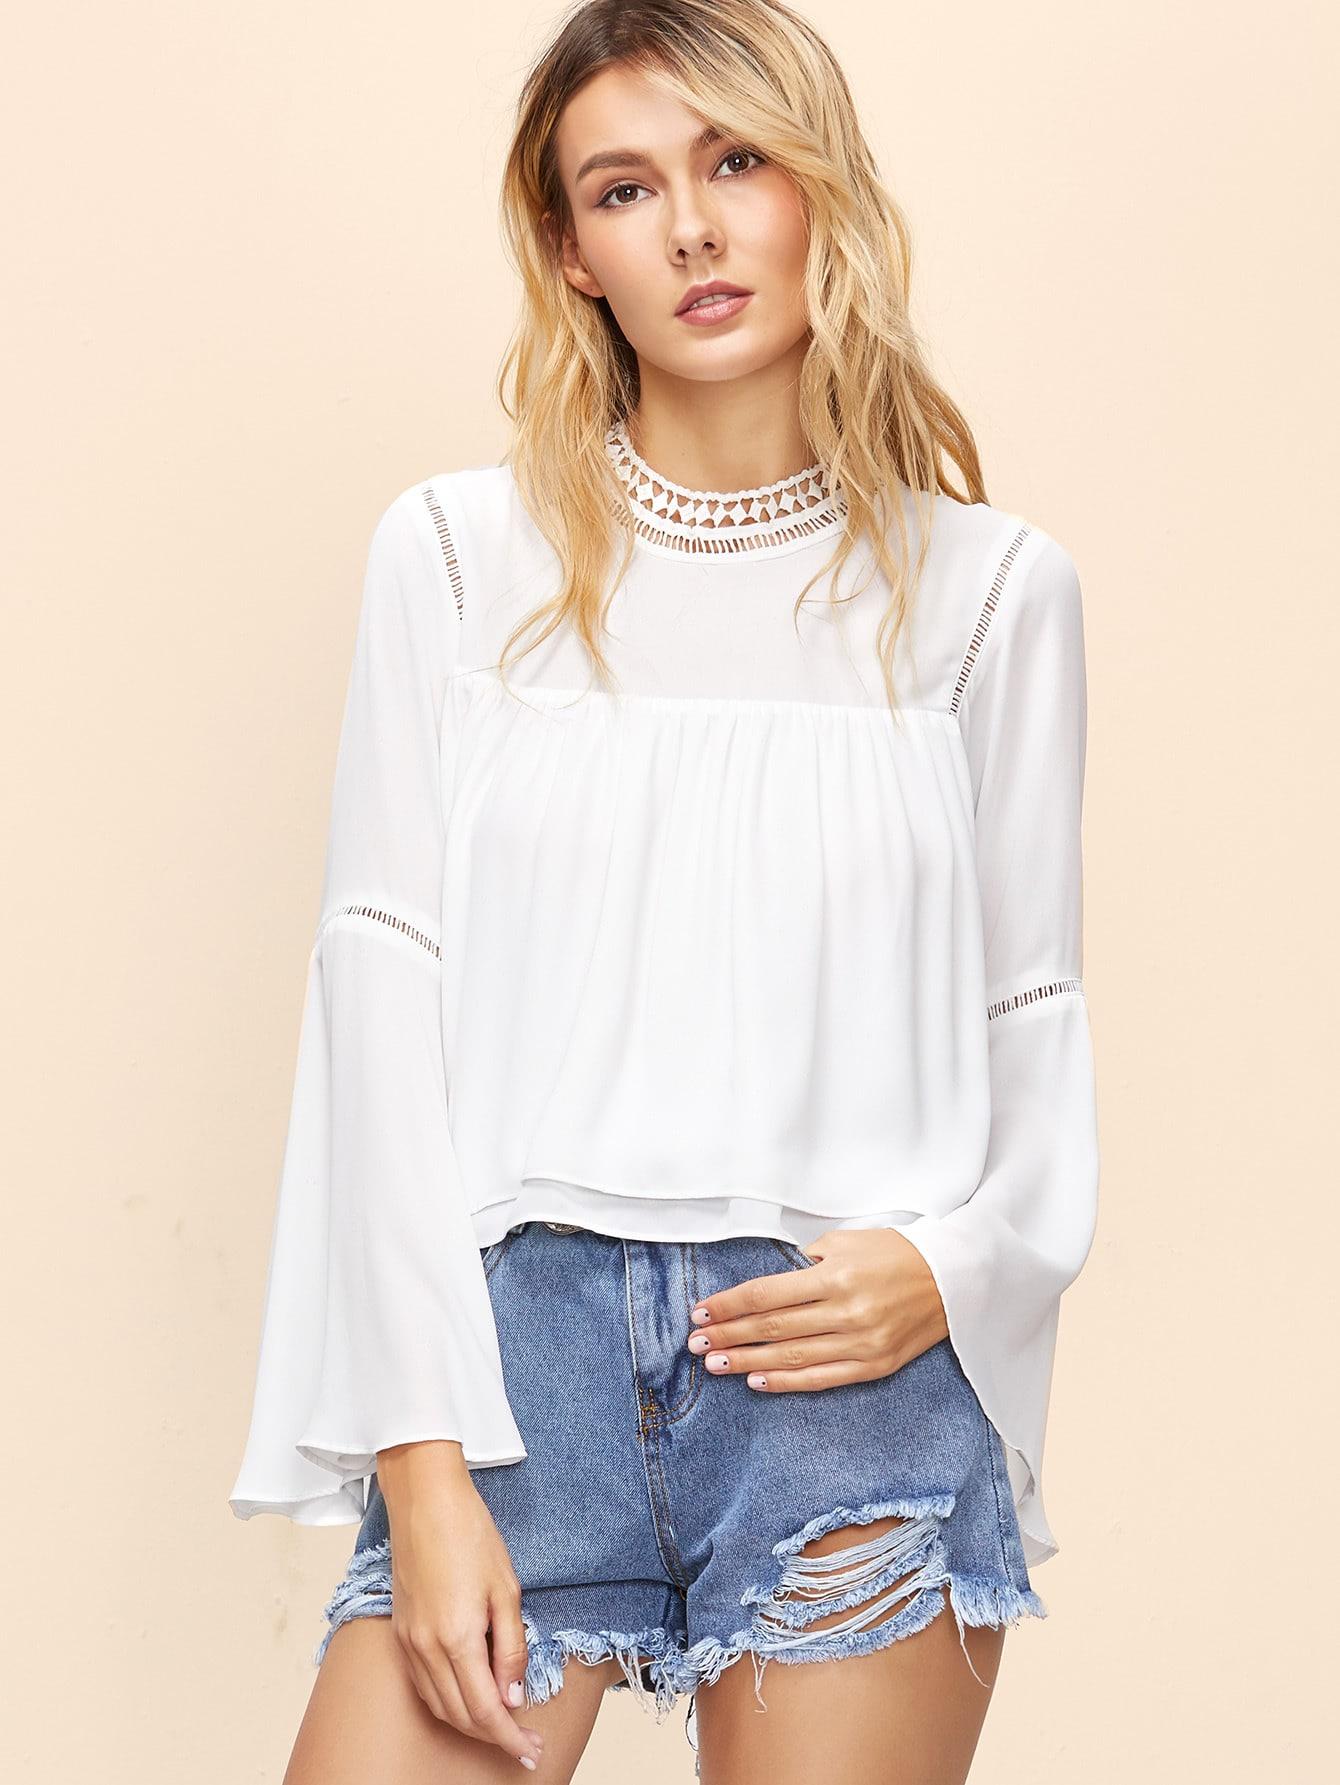 blouse161102703_2